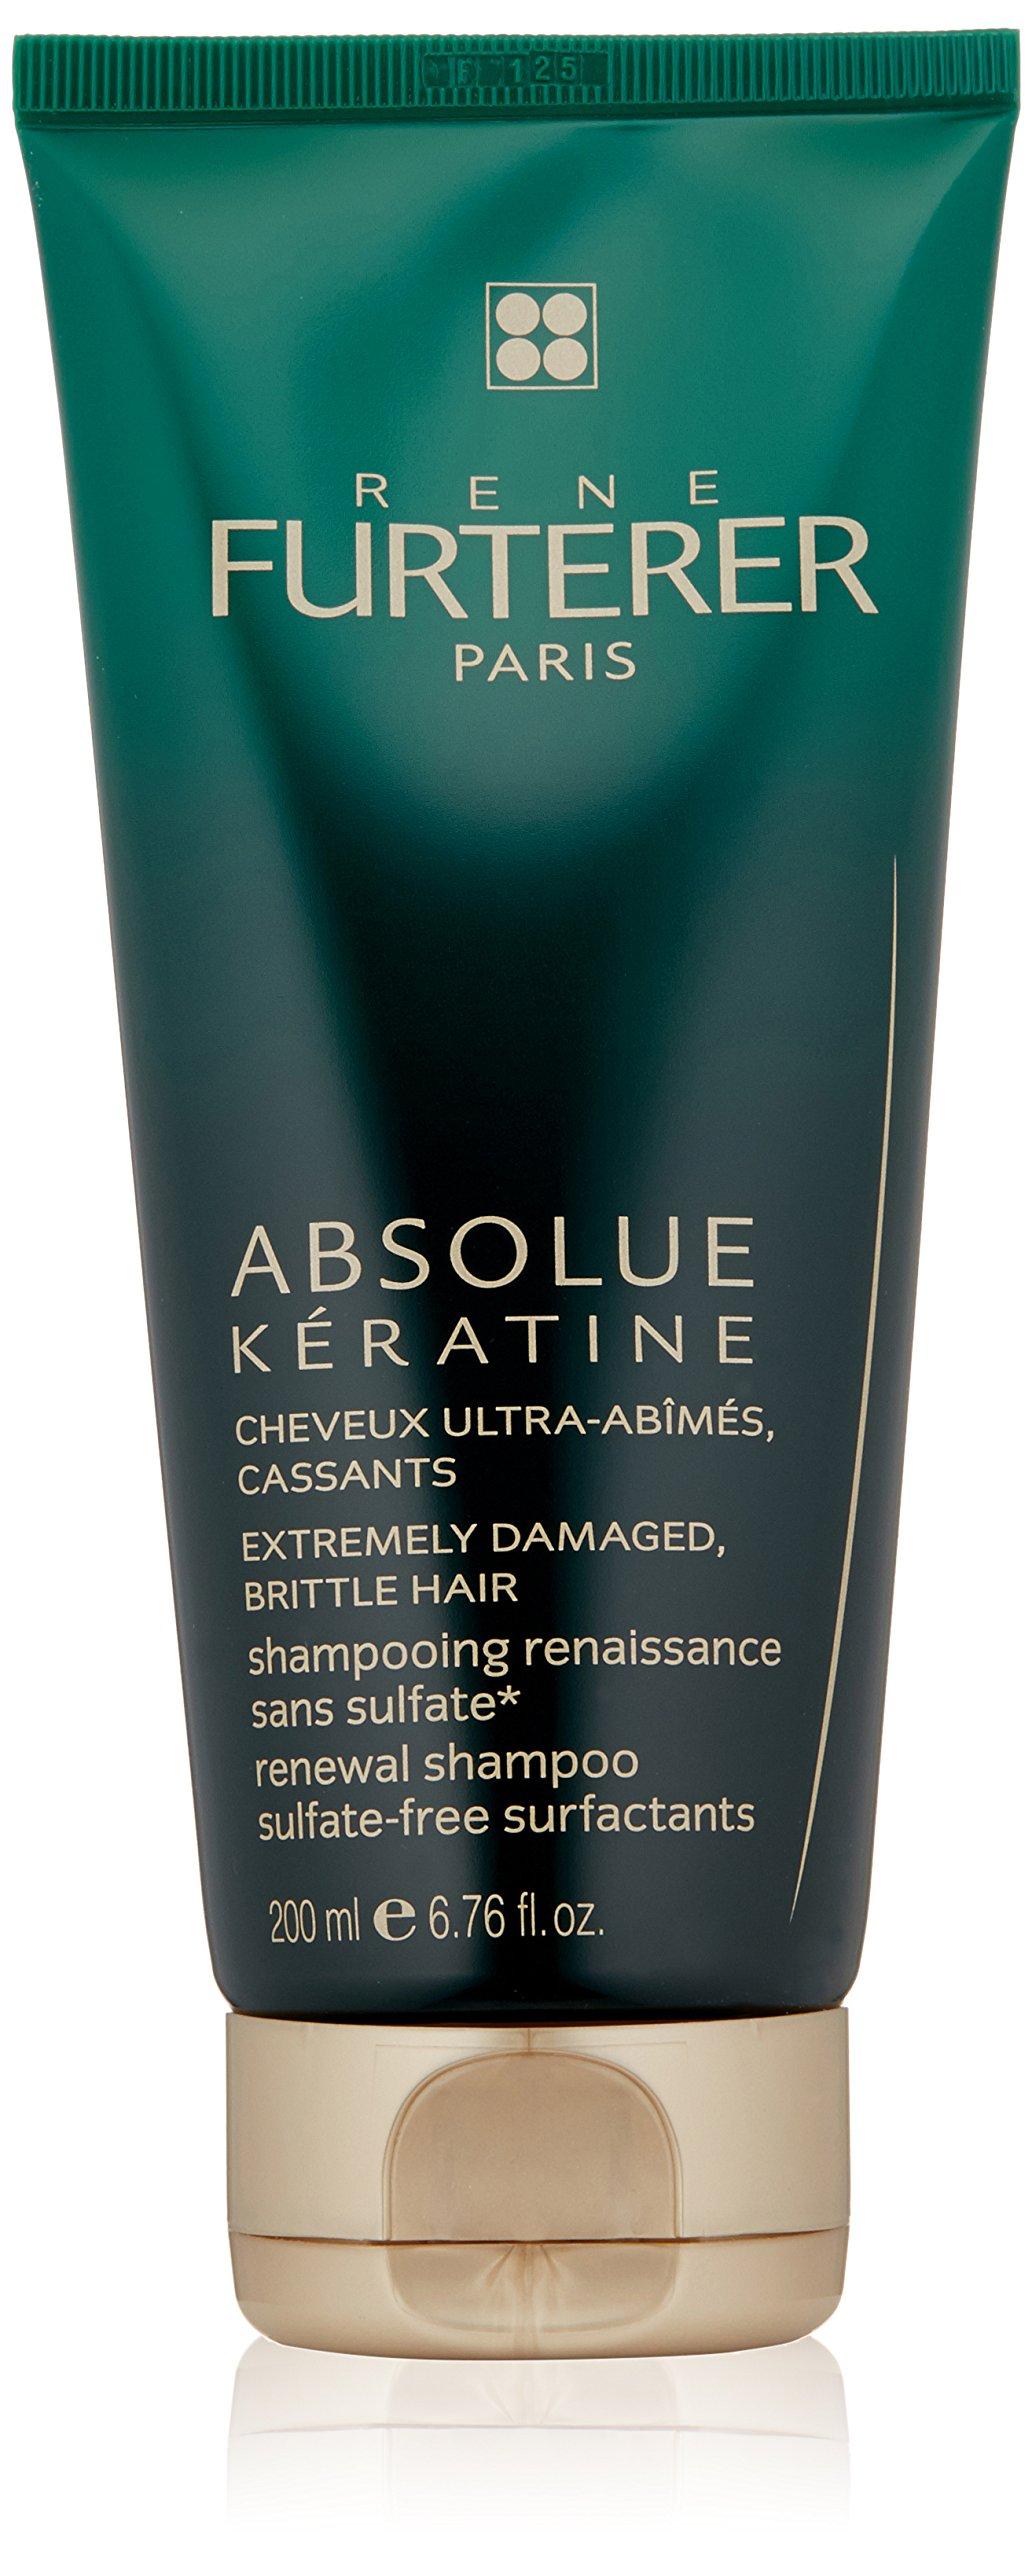 Rene Furterer Absolue Keratine Renewal Shampoo